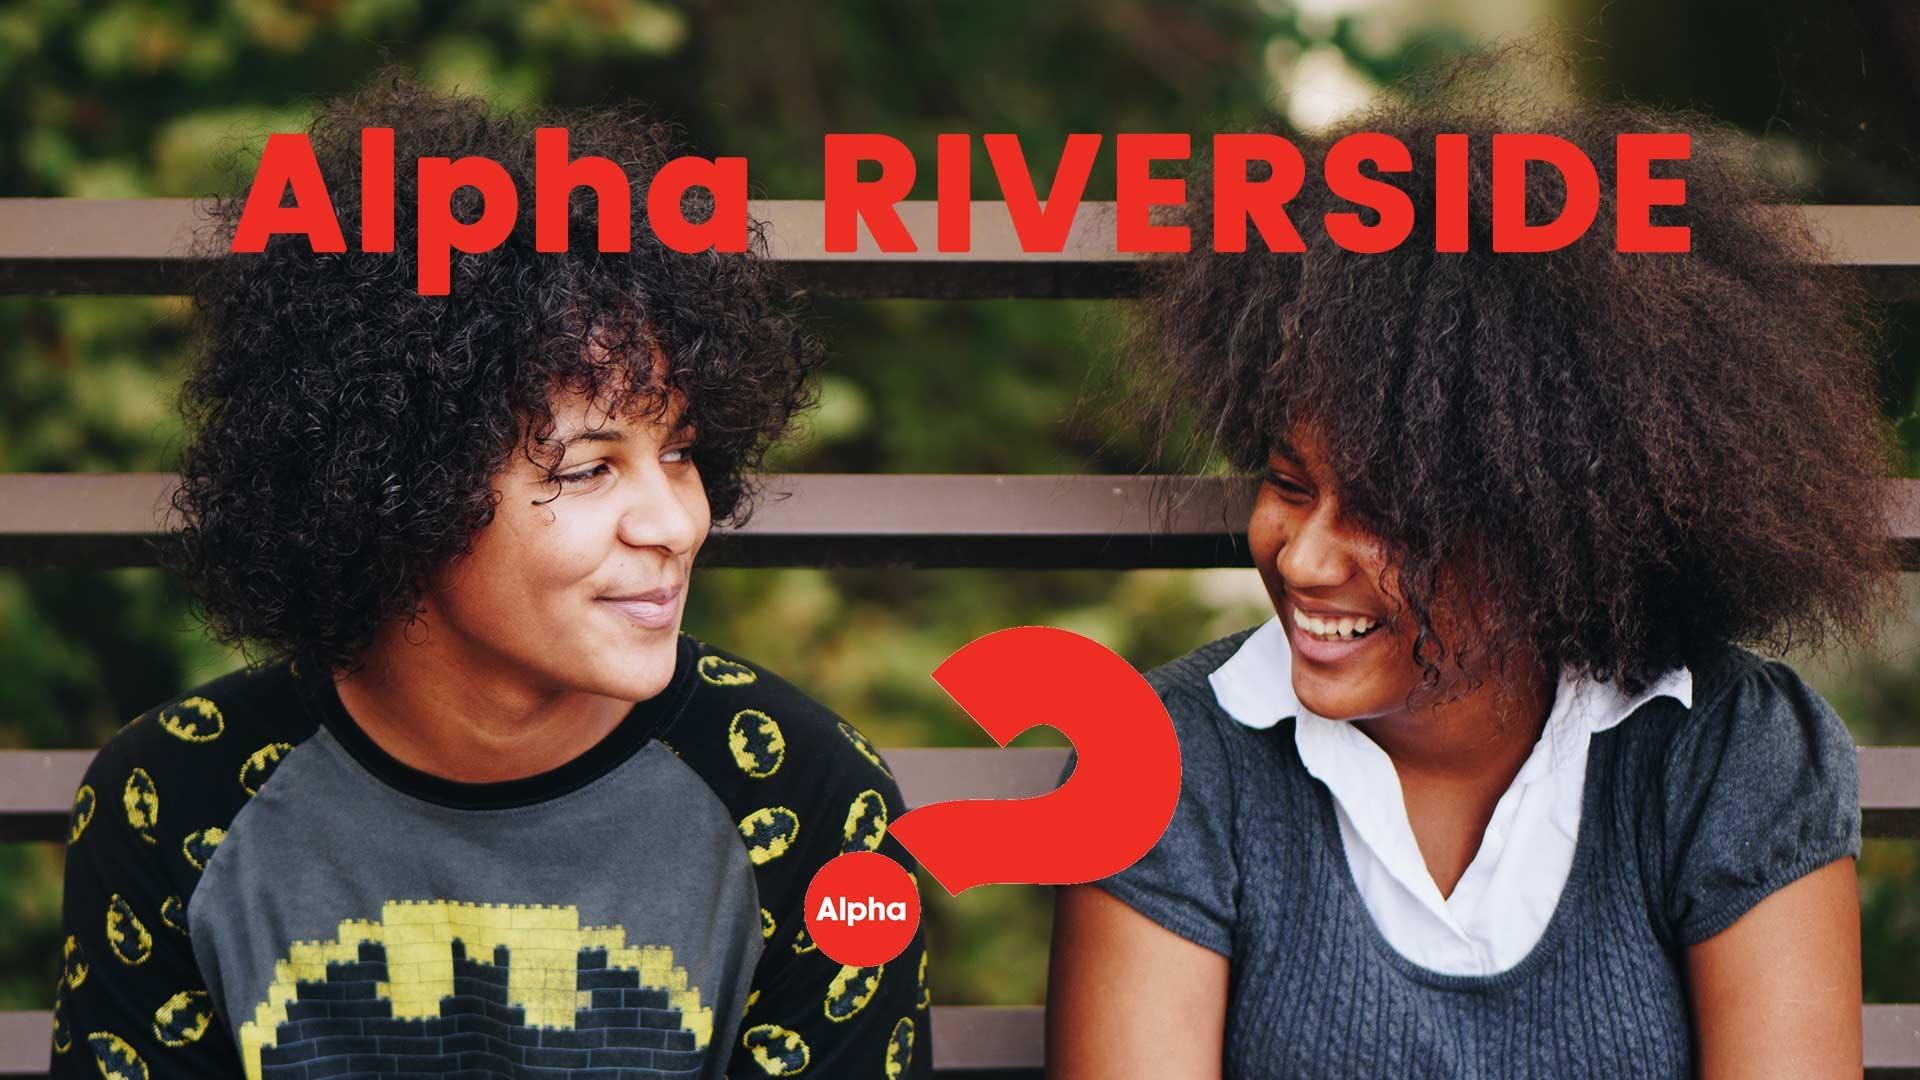 alpha-riverside.jpg